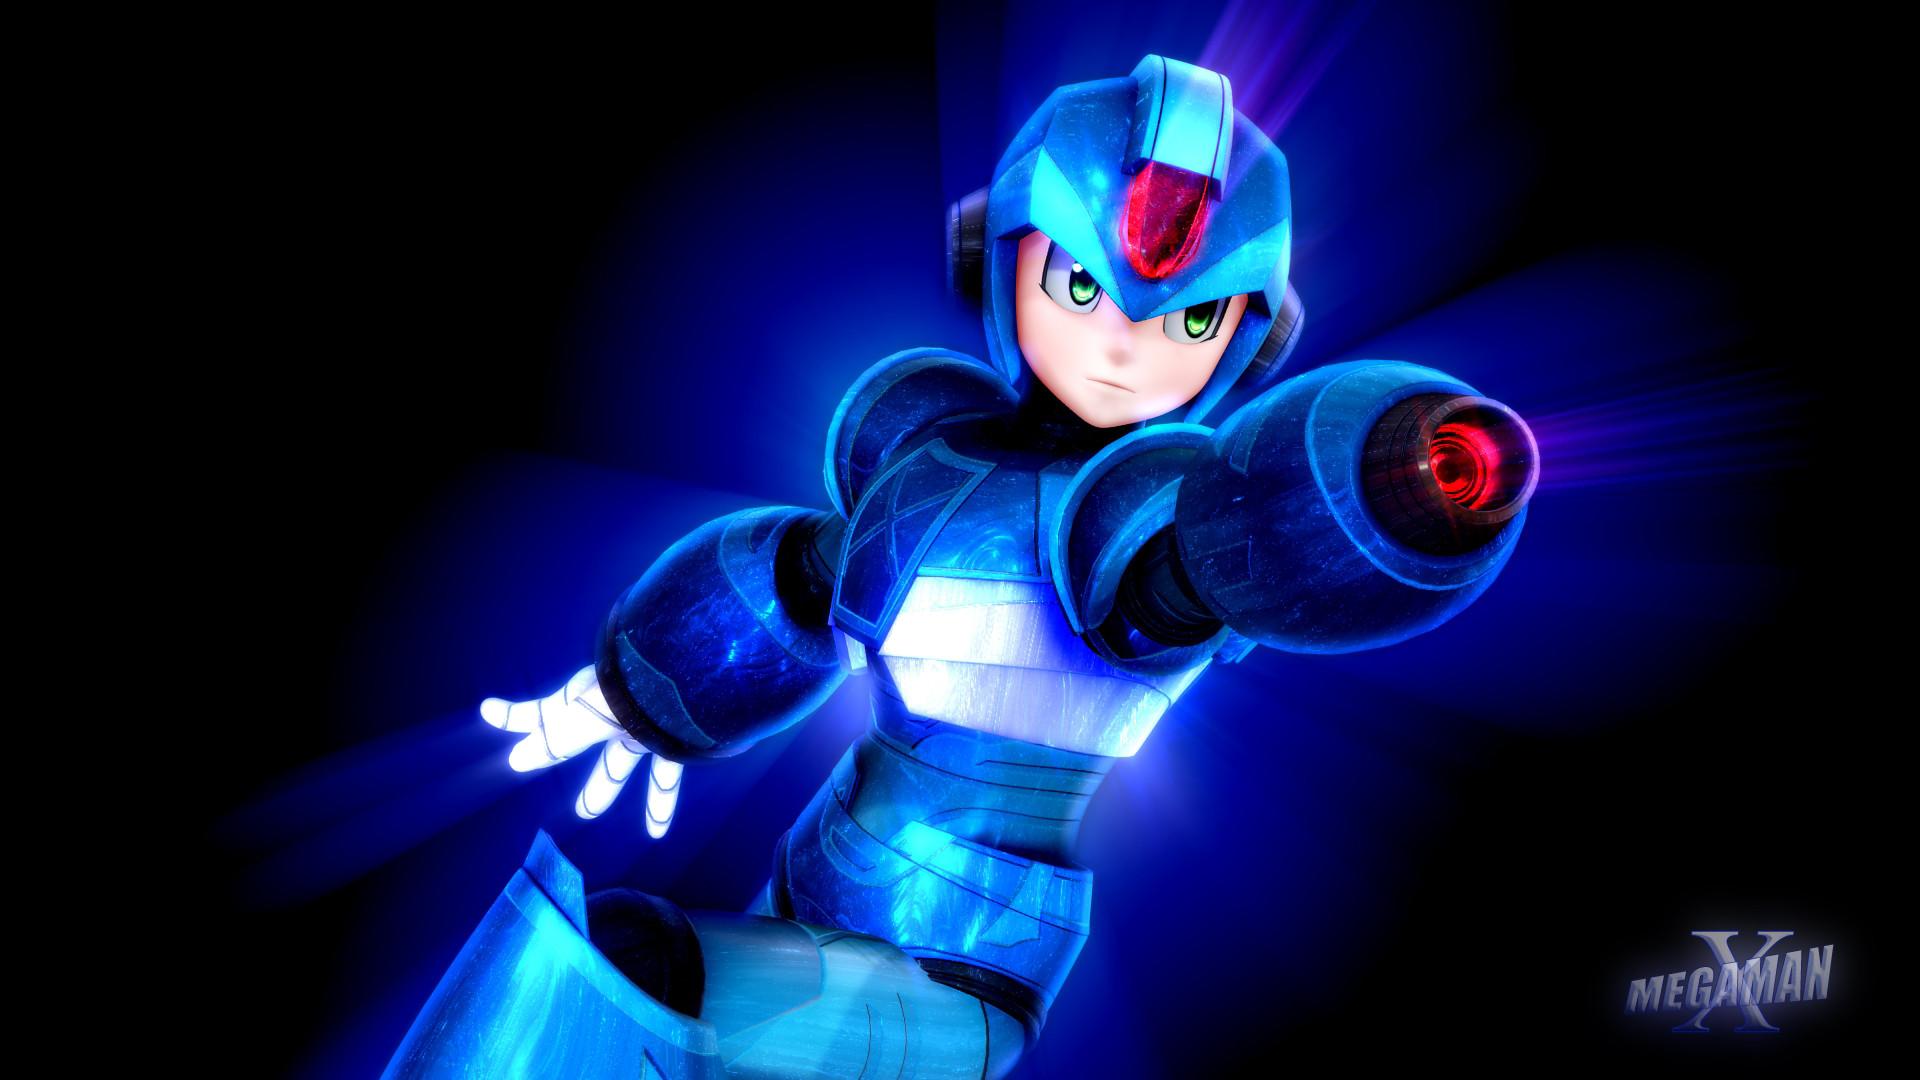 … Megaman X – Model Download by GS-Mantis